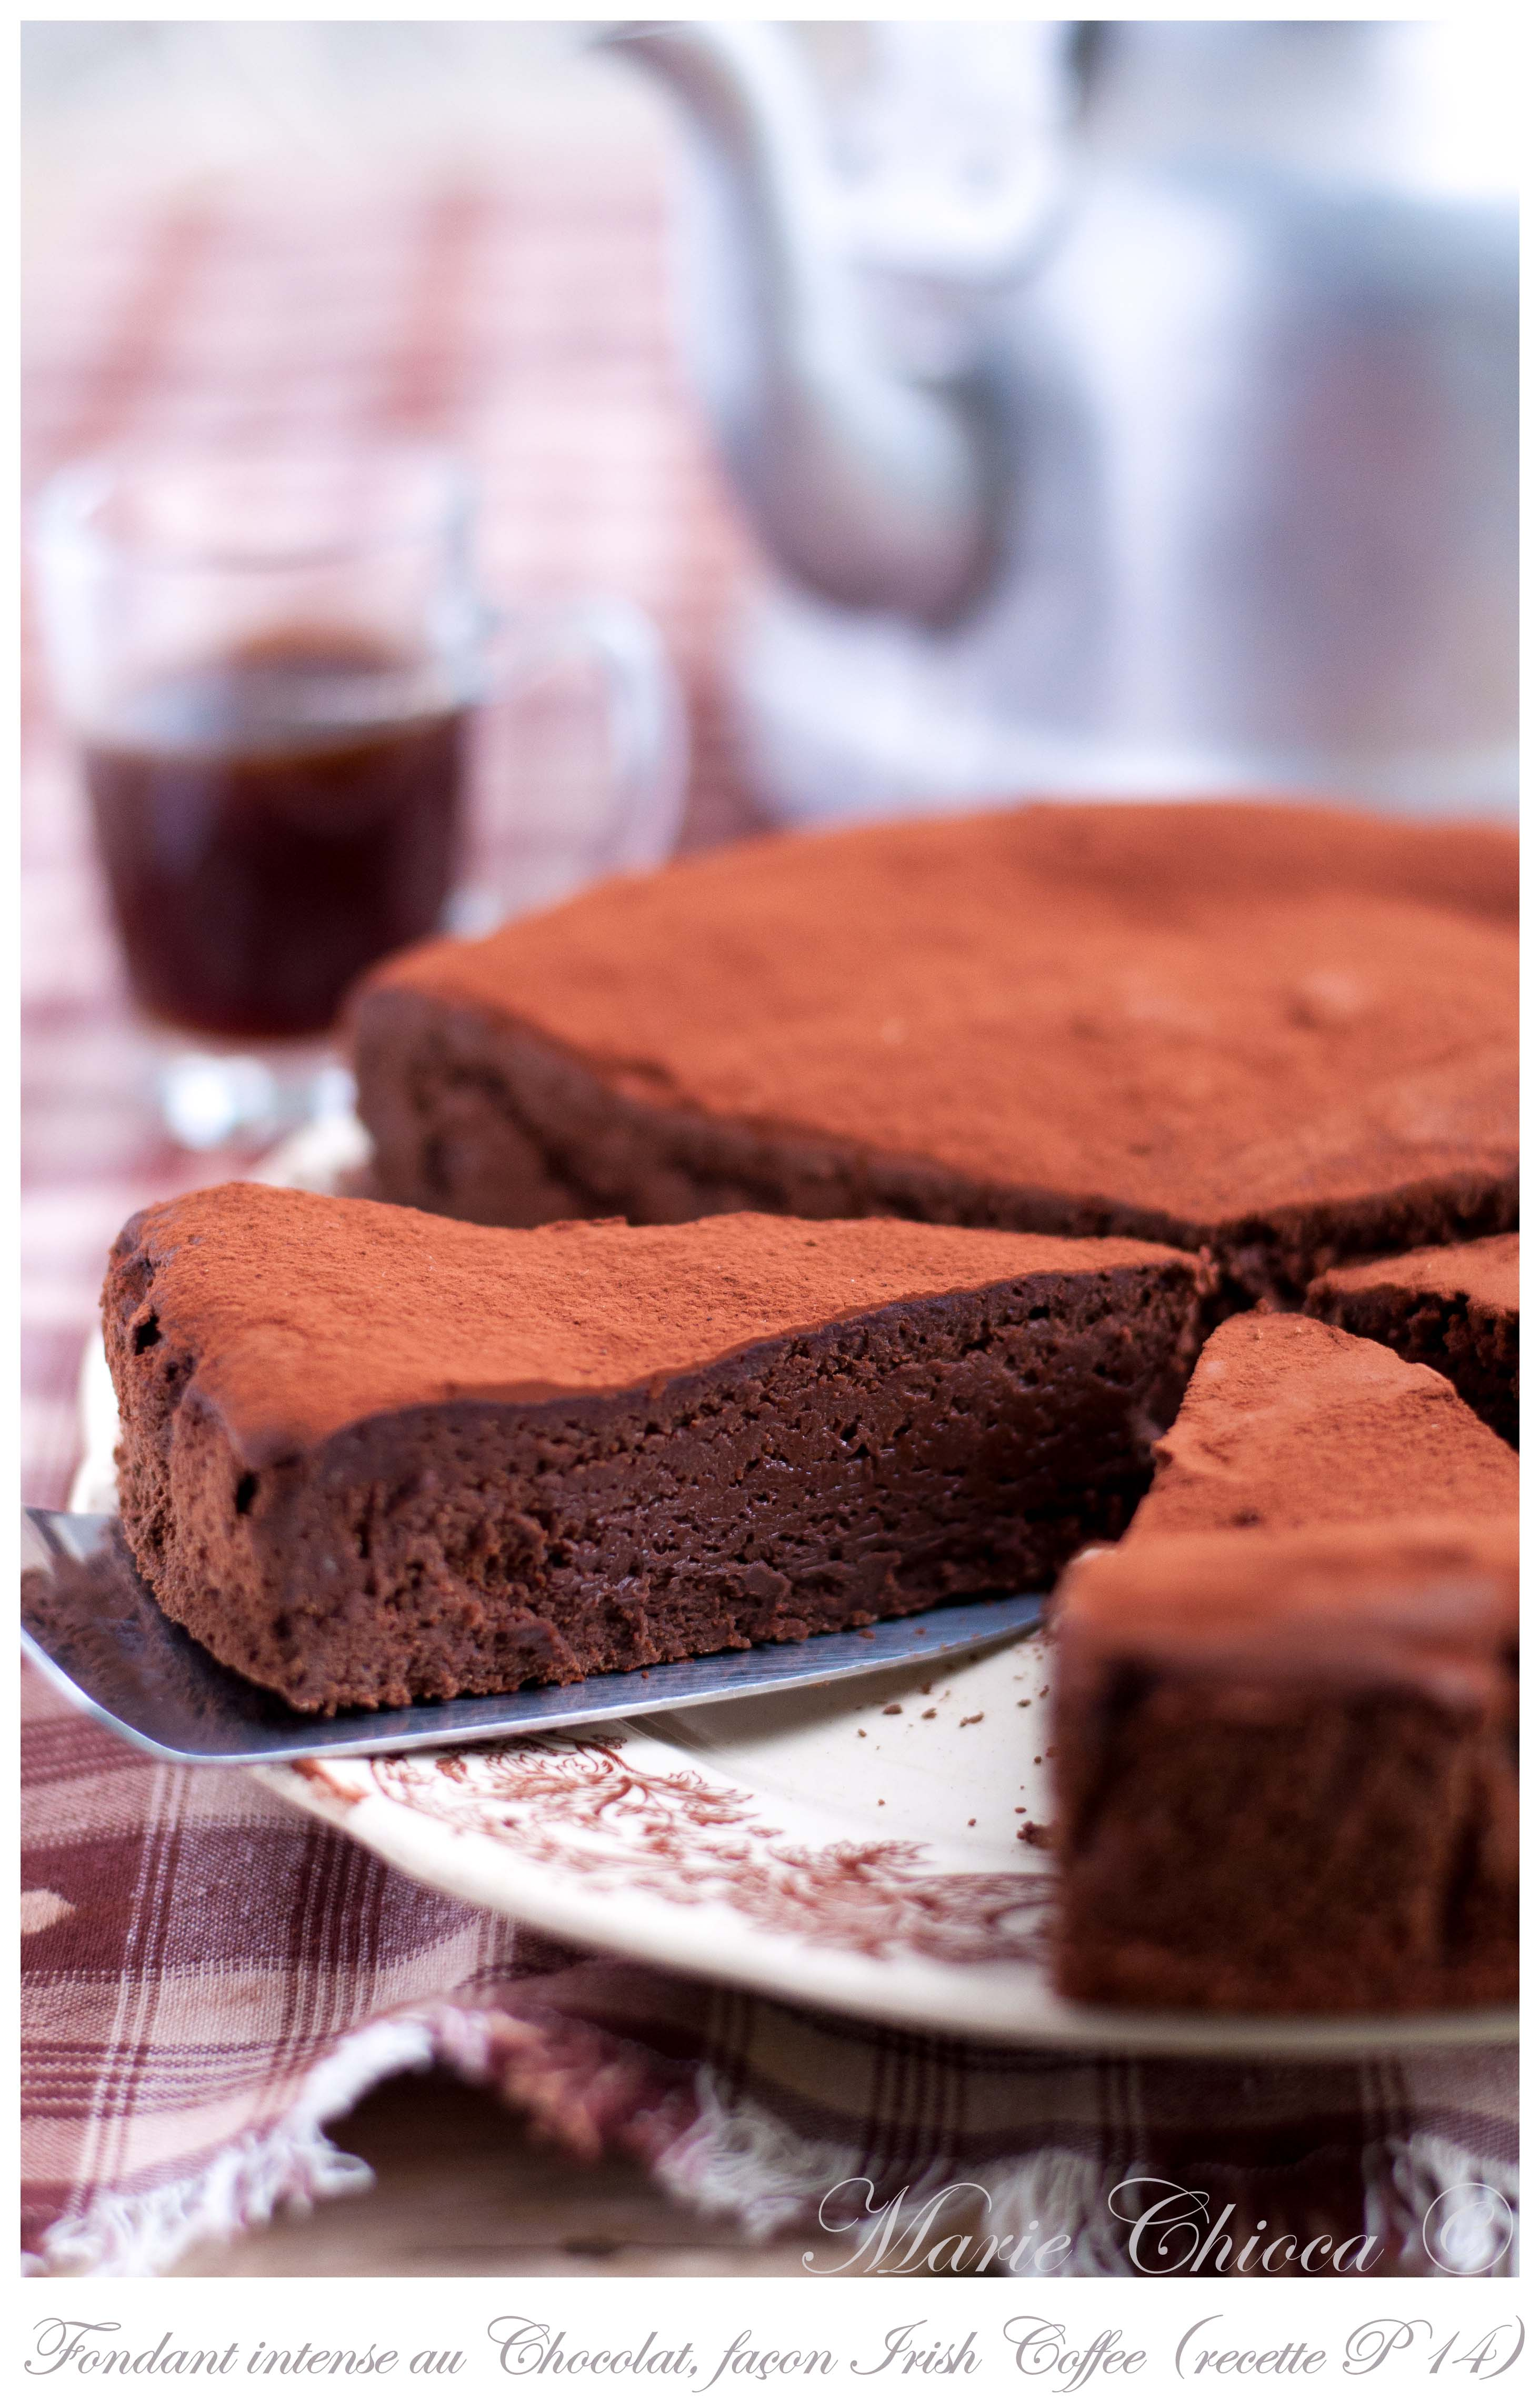 Fondant au chocolat très intense façon irish coffe-2